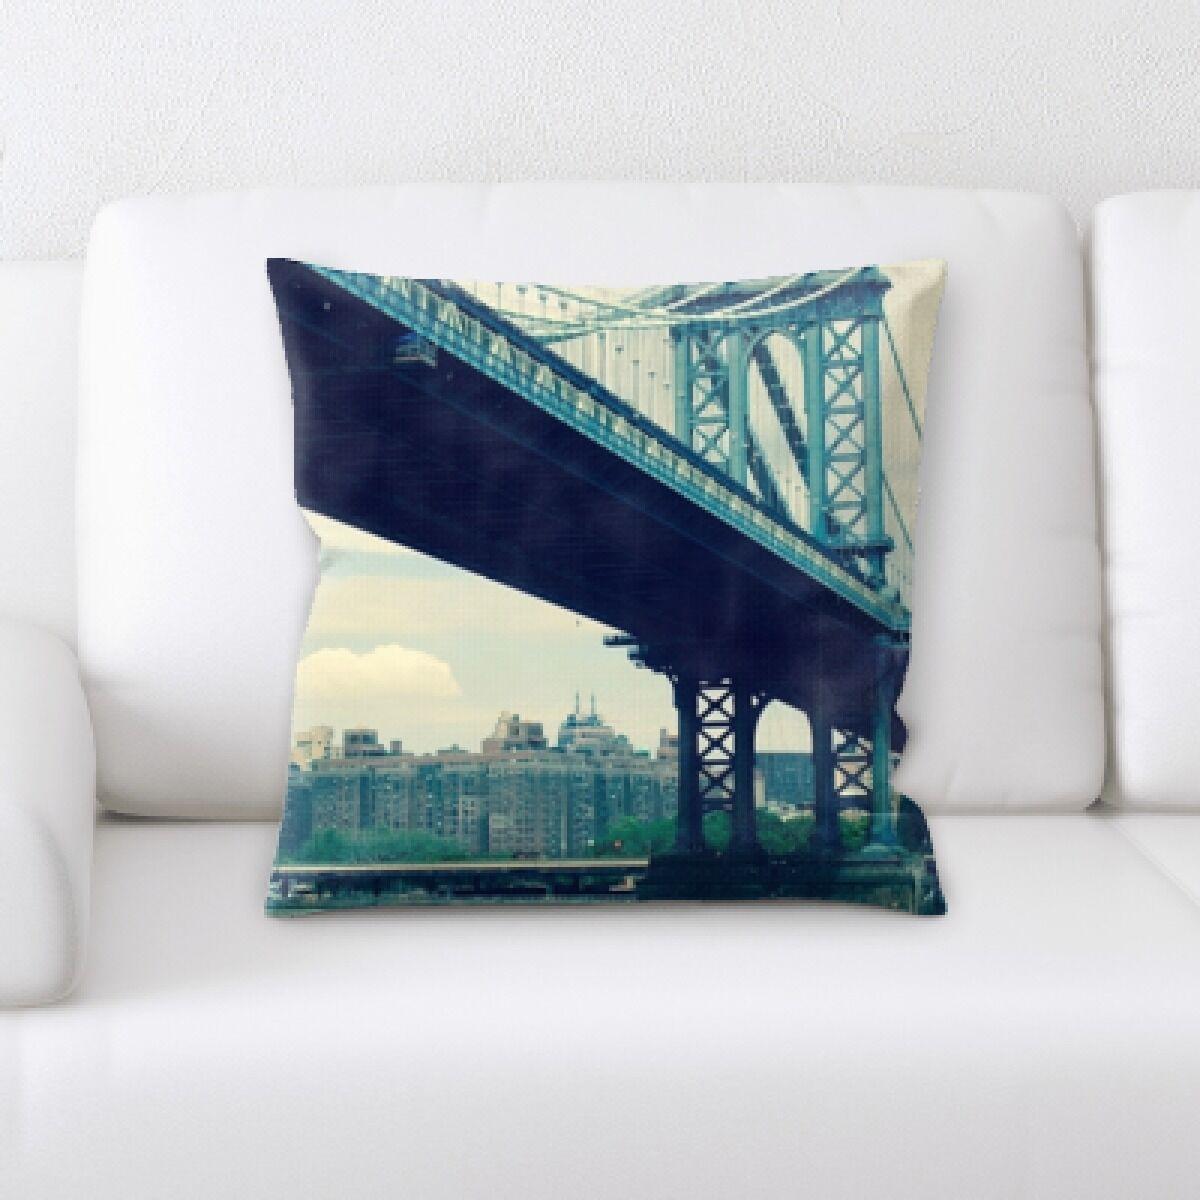 Bourke City of New York Throw Pillow